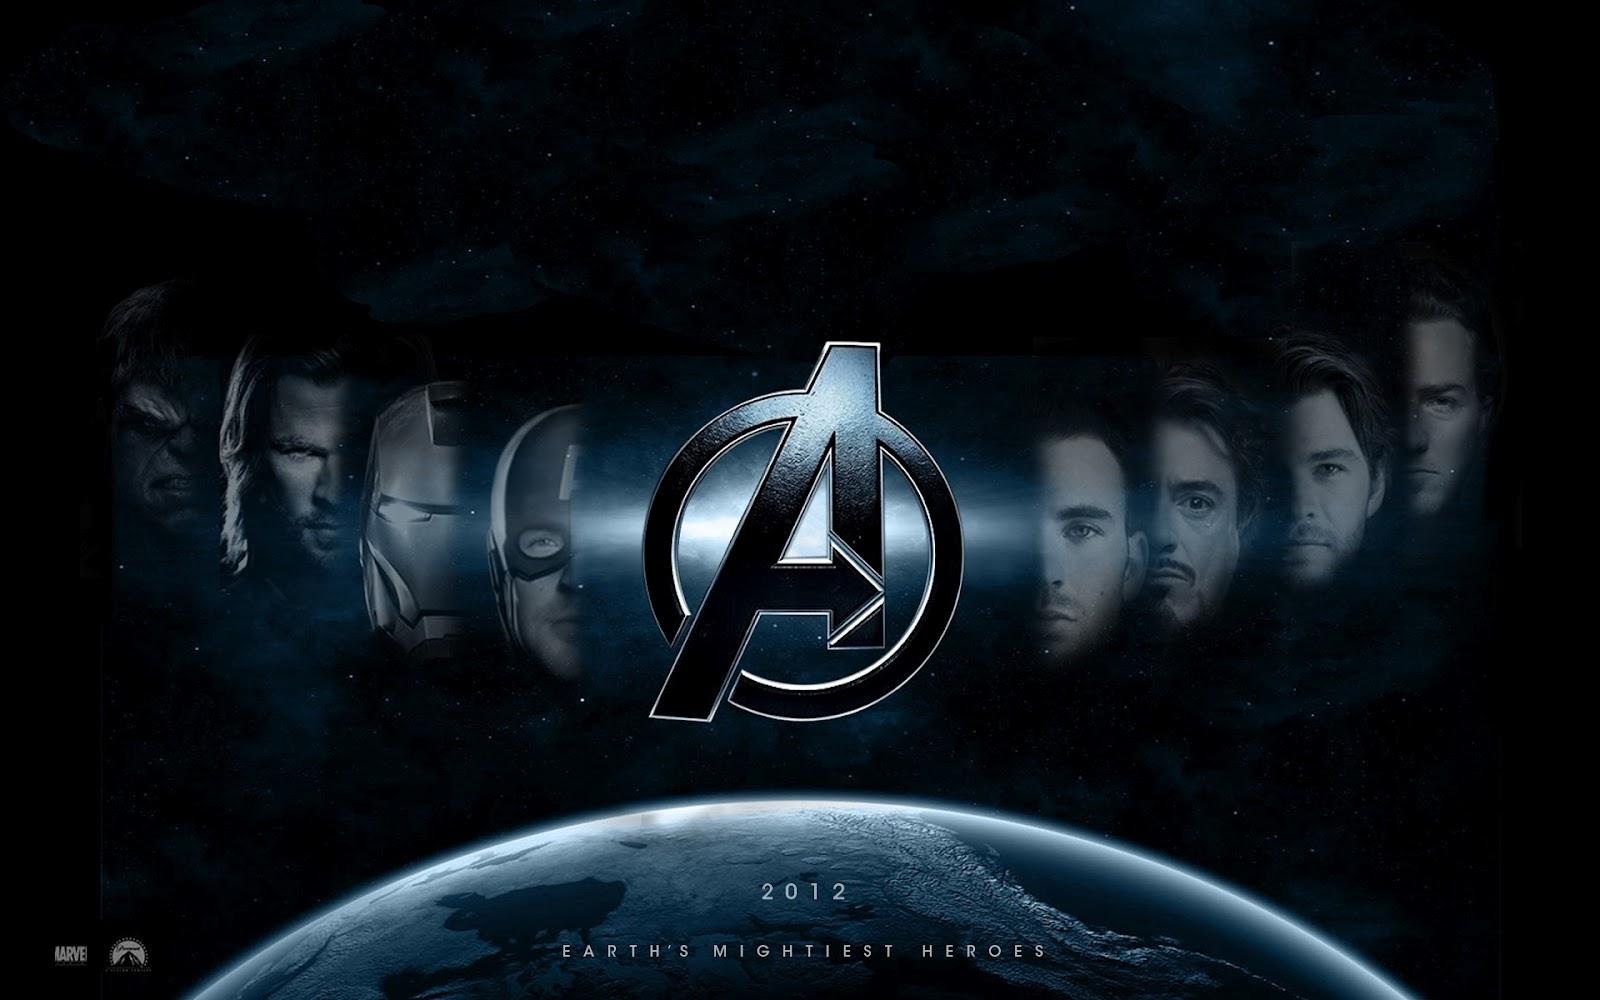 http://2.bp.blogspot.com/-Or44F6O_2Ak/UBpbxN9ga0I/AAAAAAAAAT0/njXwNbsneXs/s1600/2-+Edward_Norton_Avengers.jpg